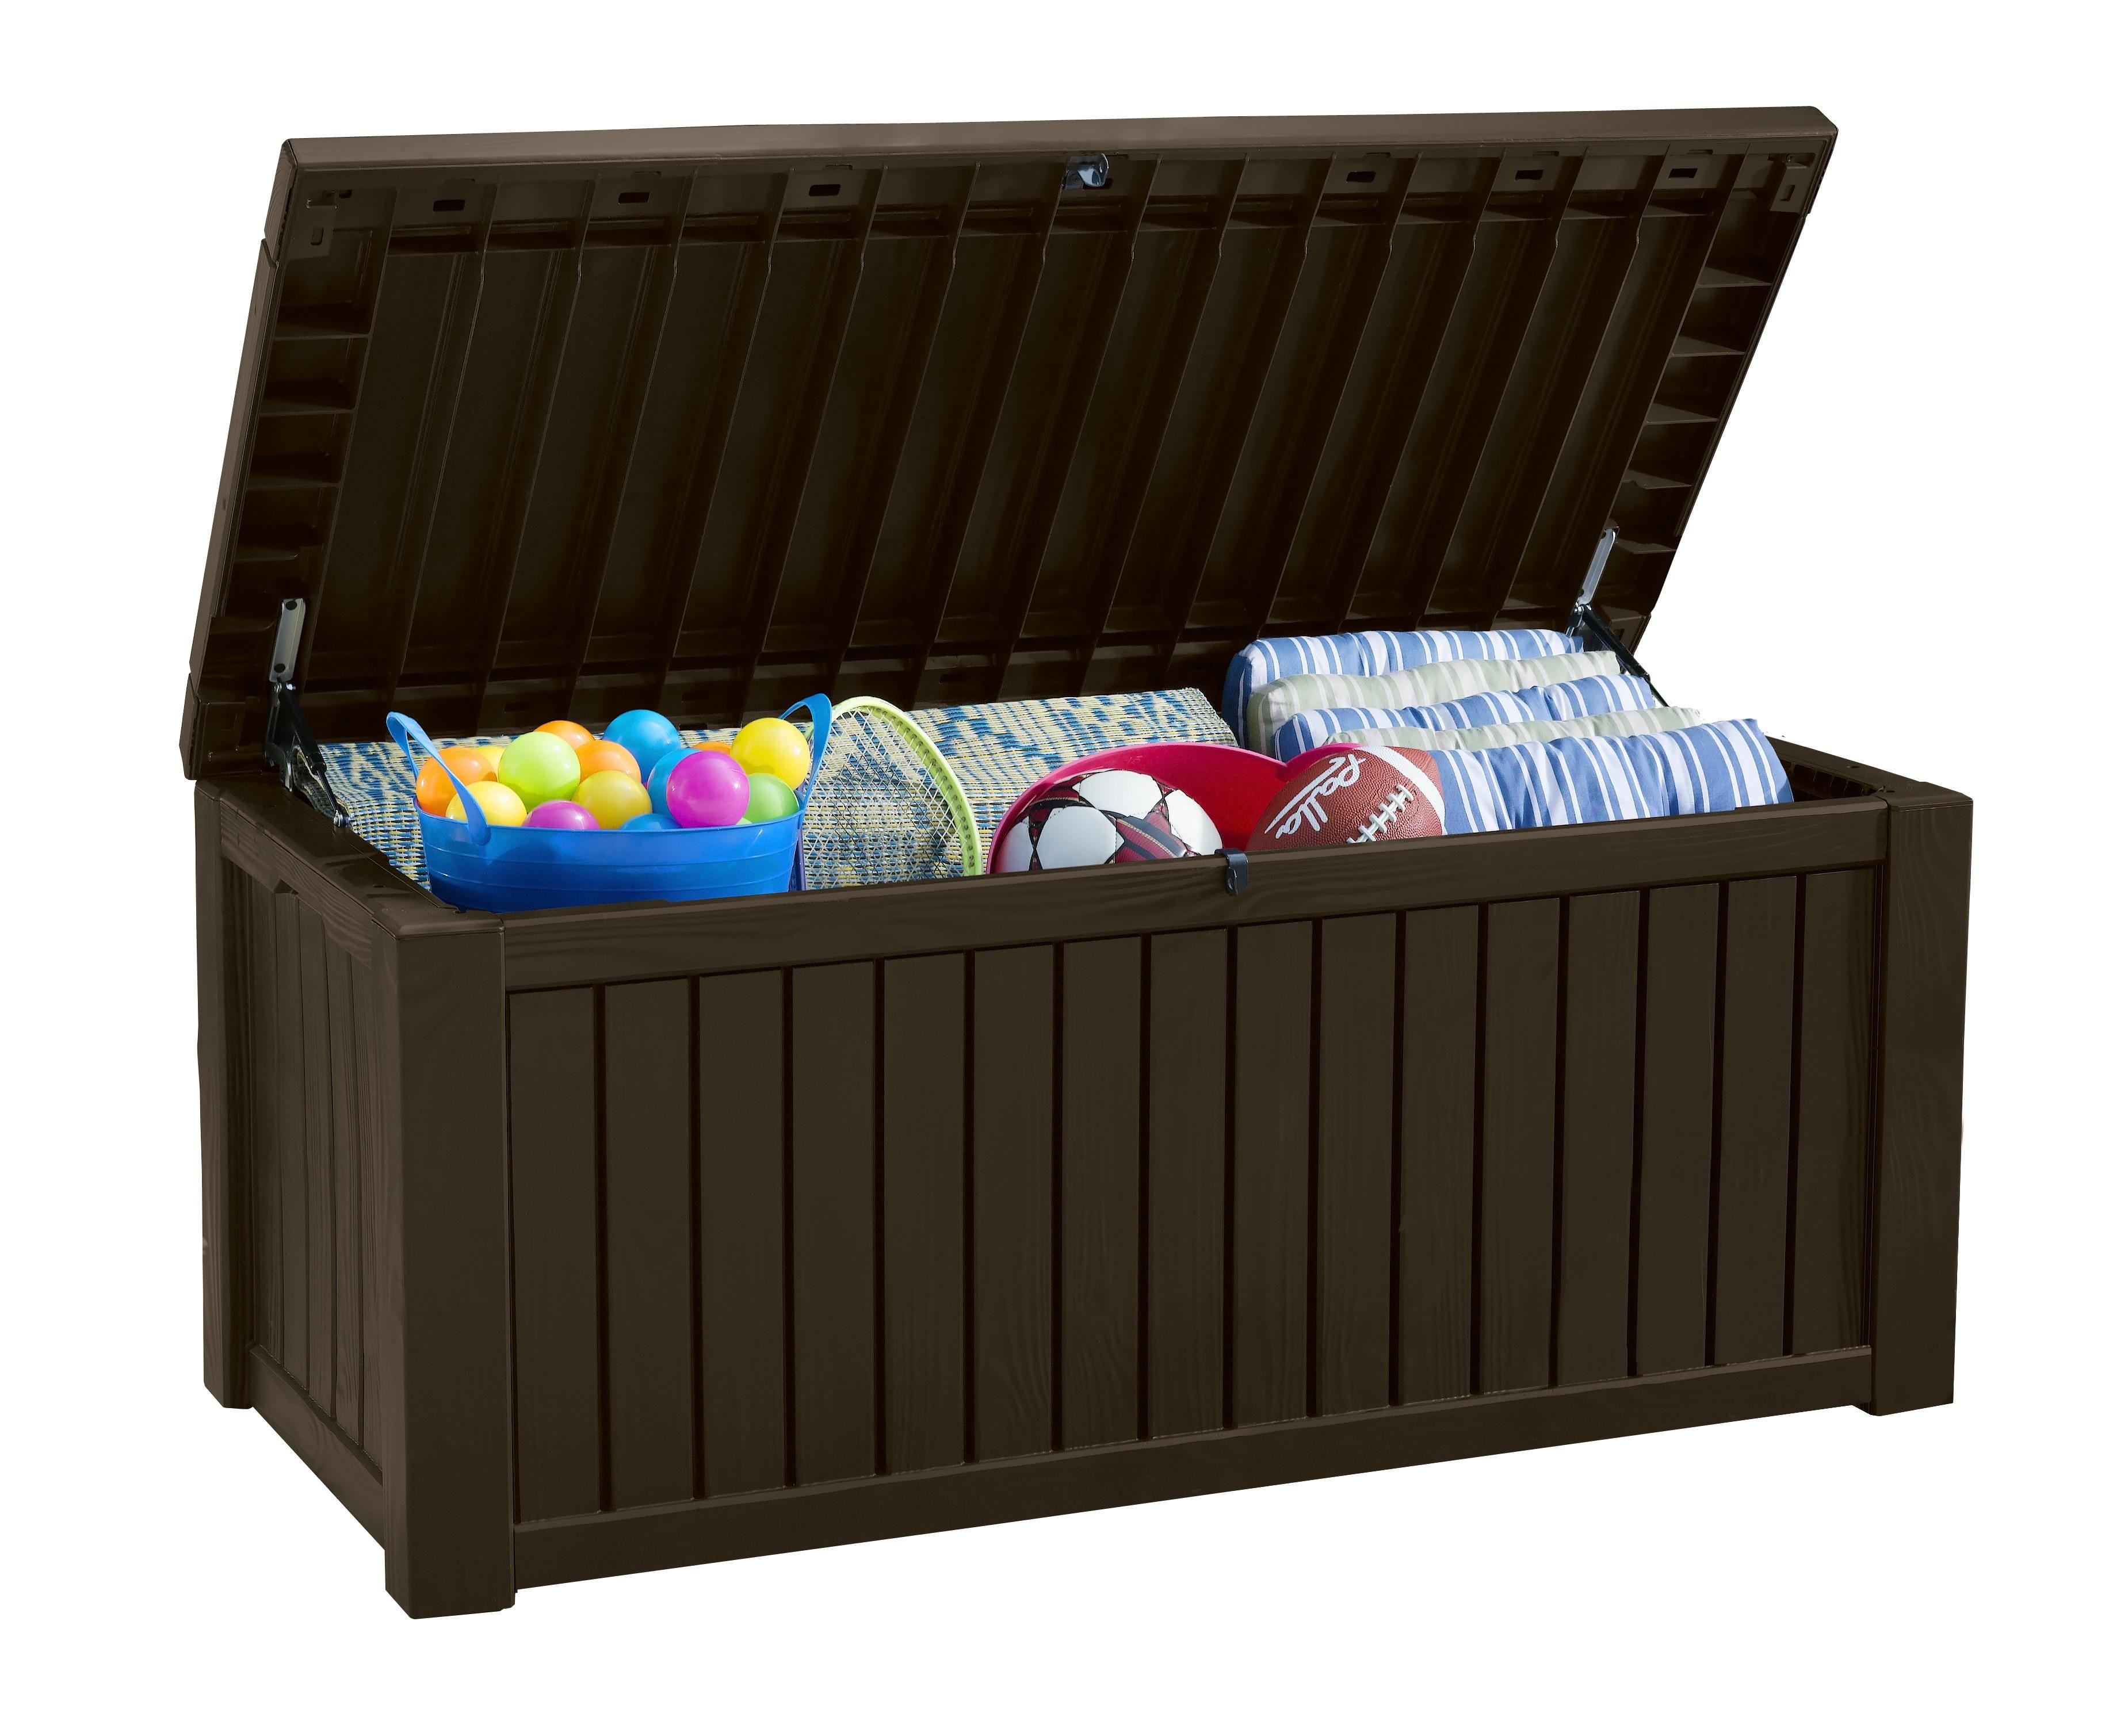 Keter Rockwood Patio Storage Deck Box Patio Furniture Outdoor